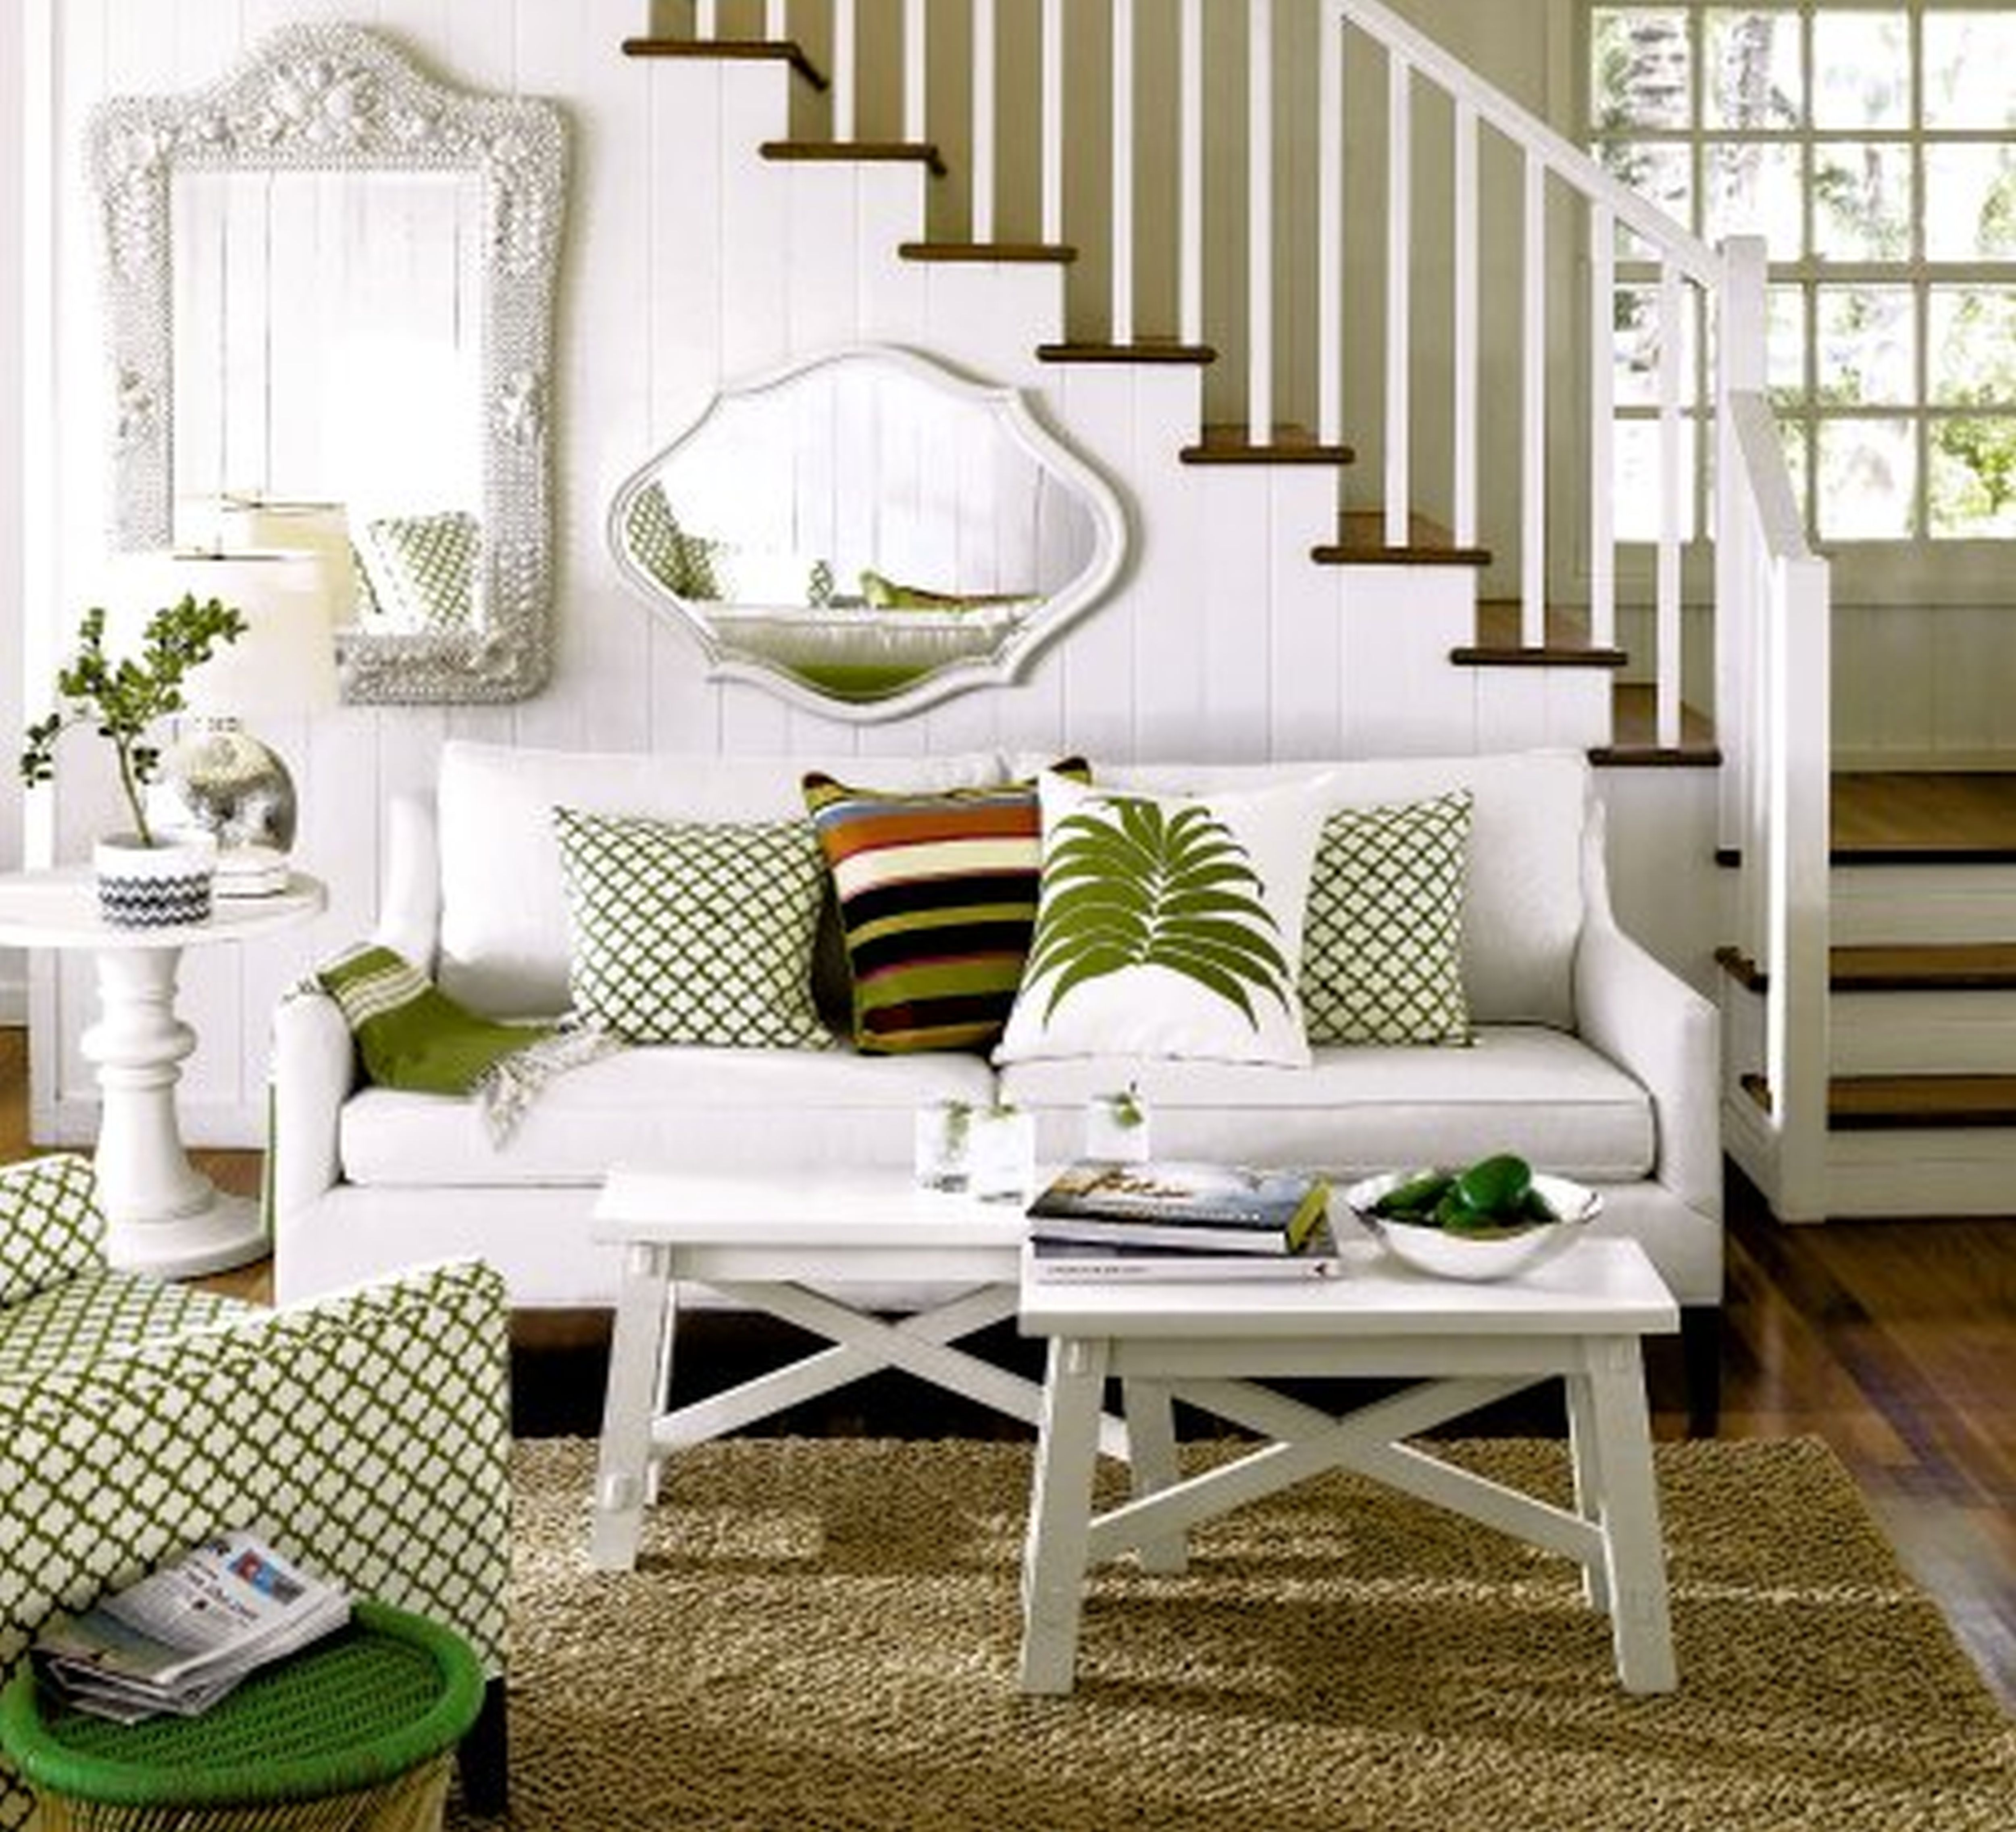 Design Ideas For Small Spaces Living Rooms Interior House Decor Inspiration Graphic Interior House Decor